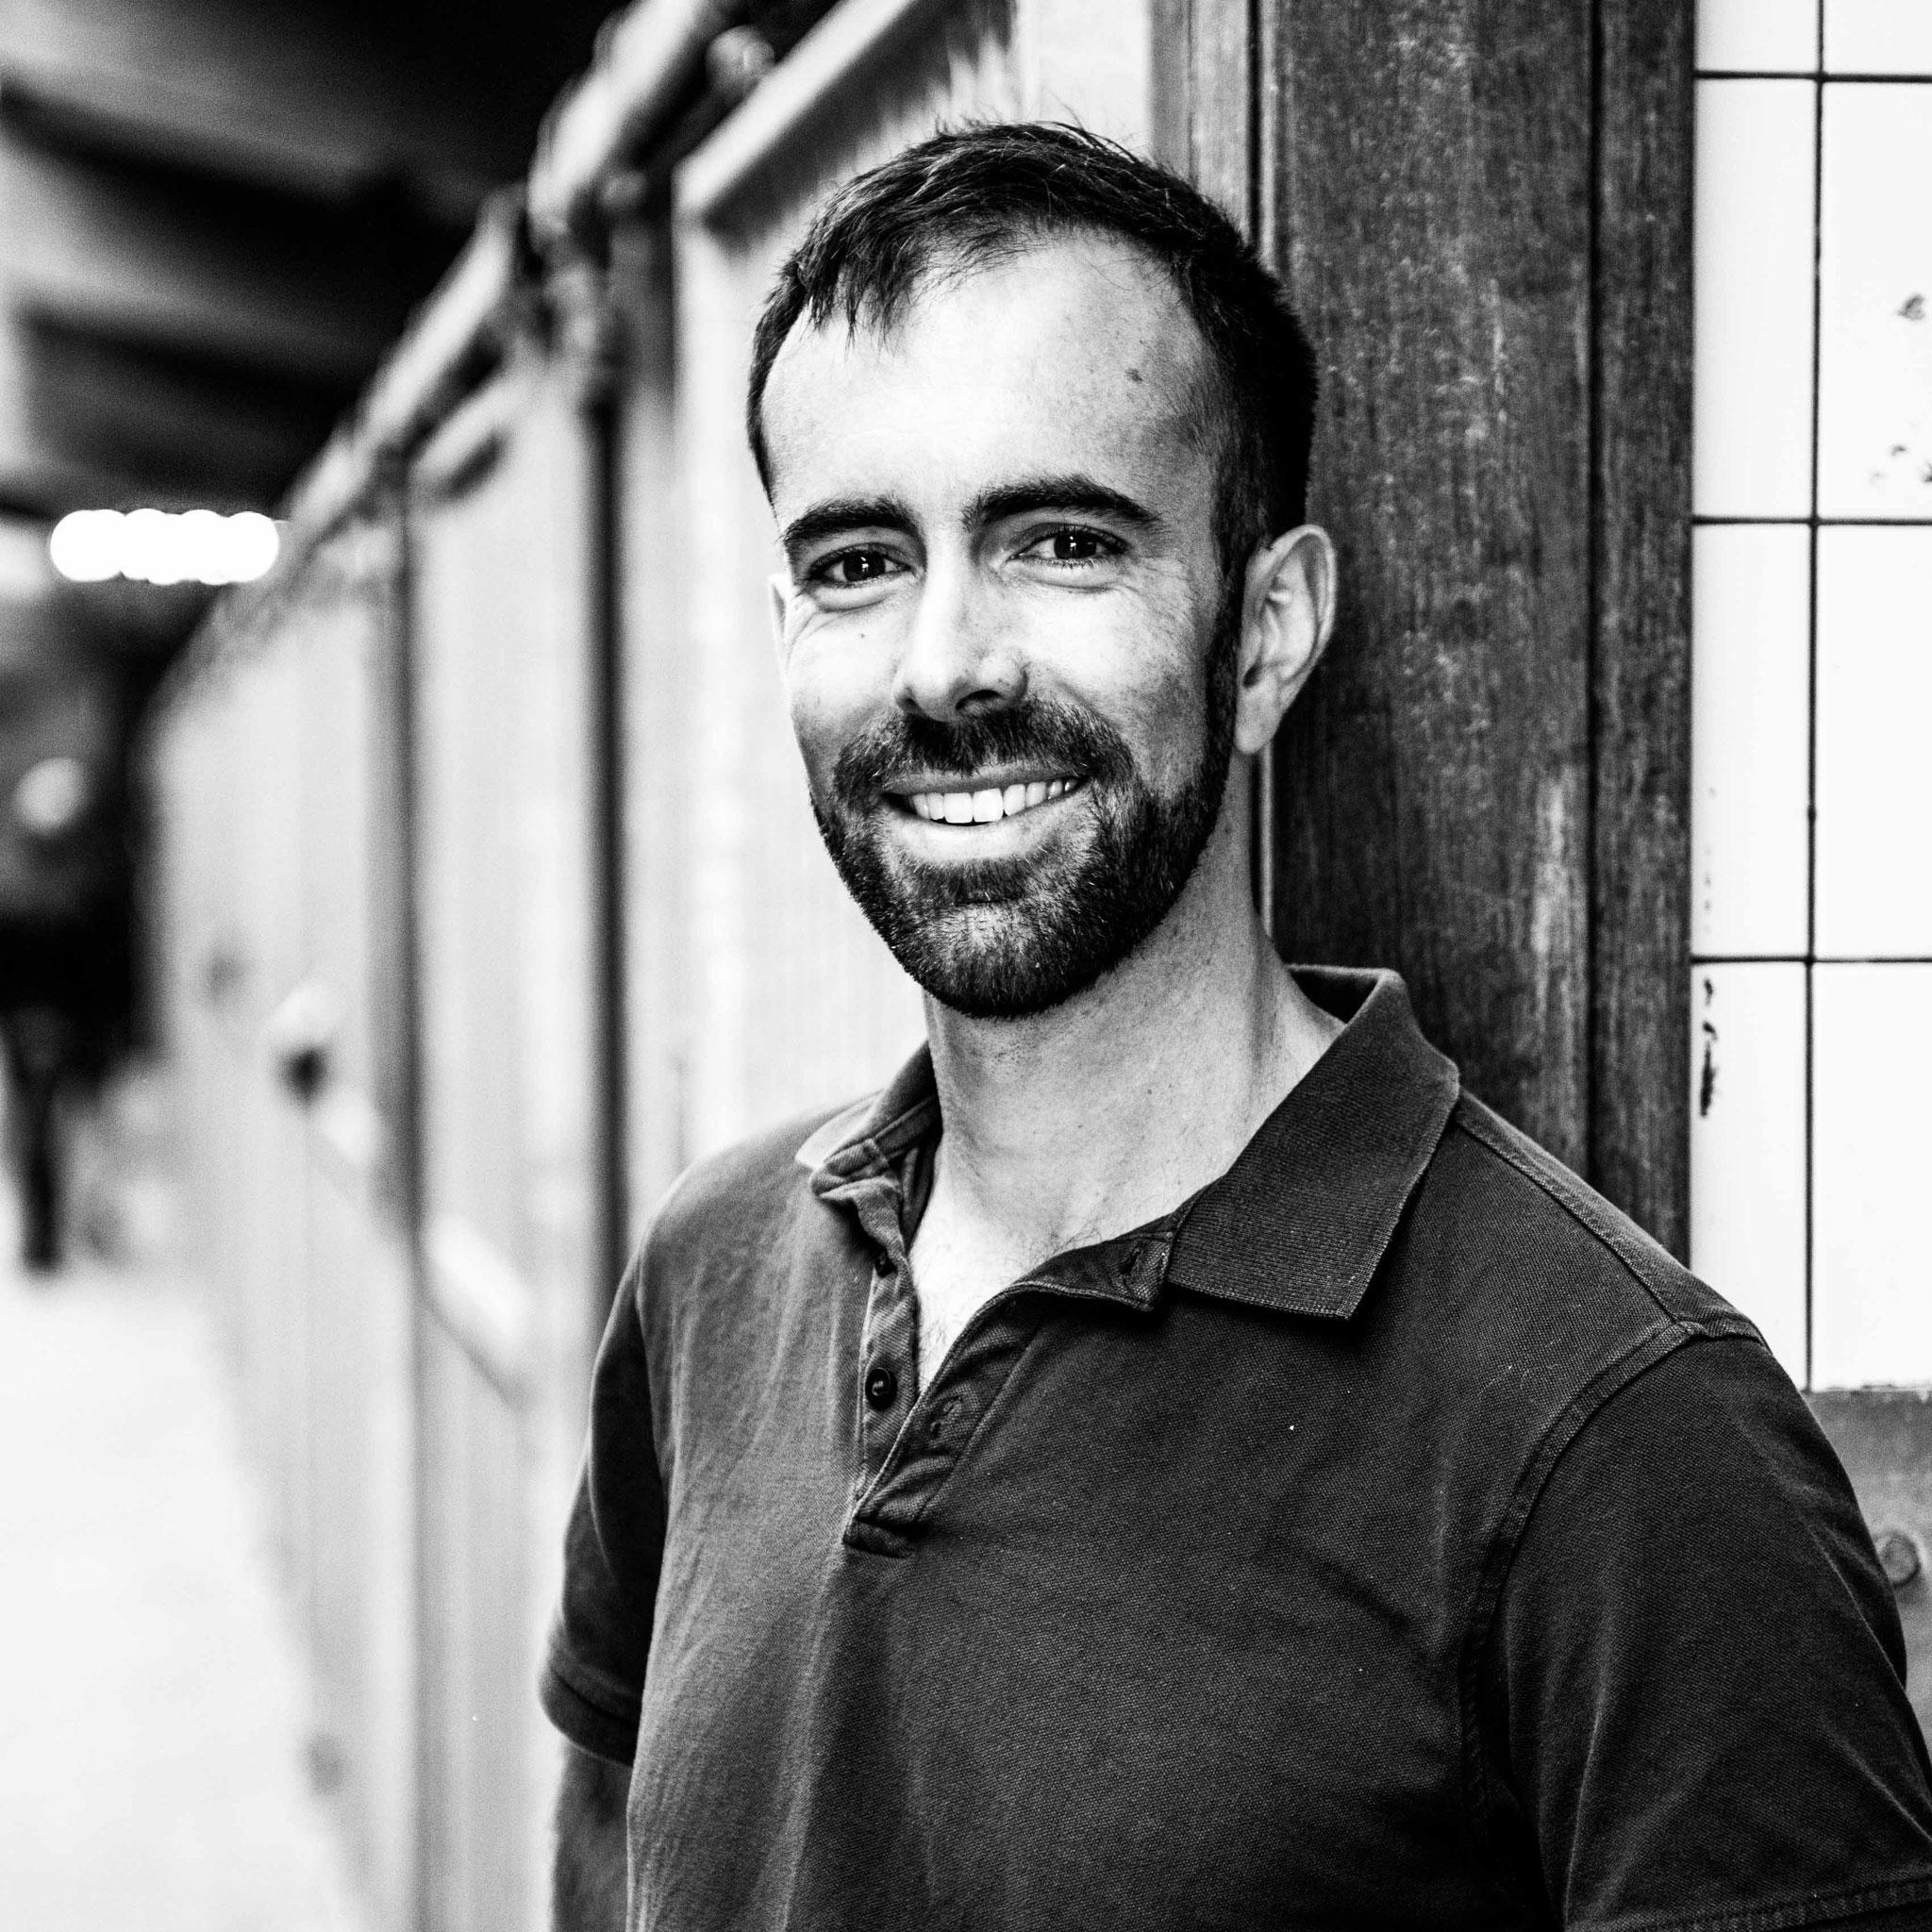 Dr. Patrick Brogan - Specialist voortplanting paarden Equiception